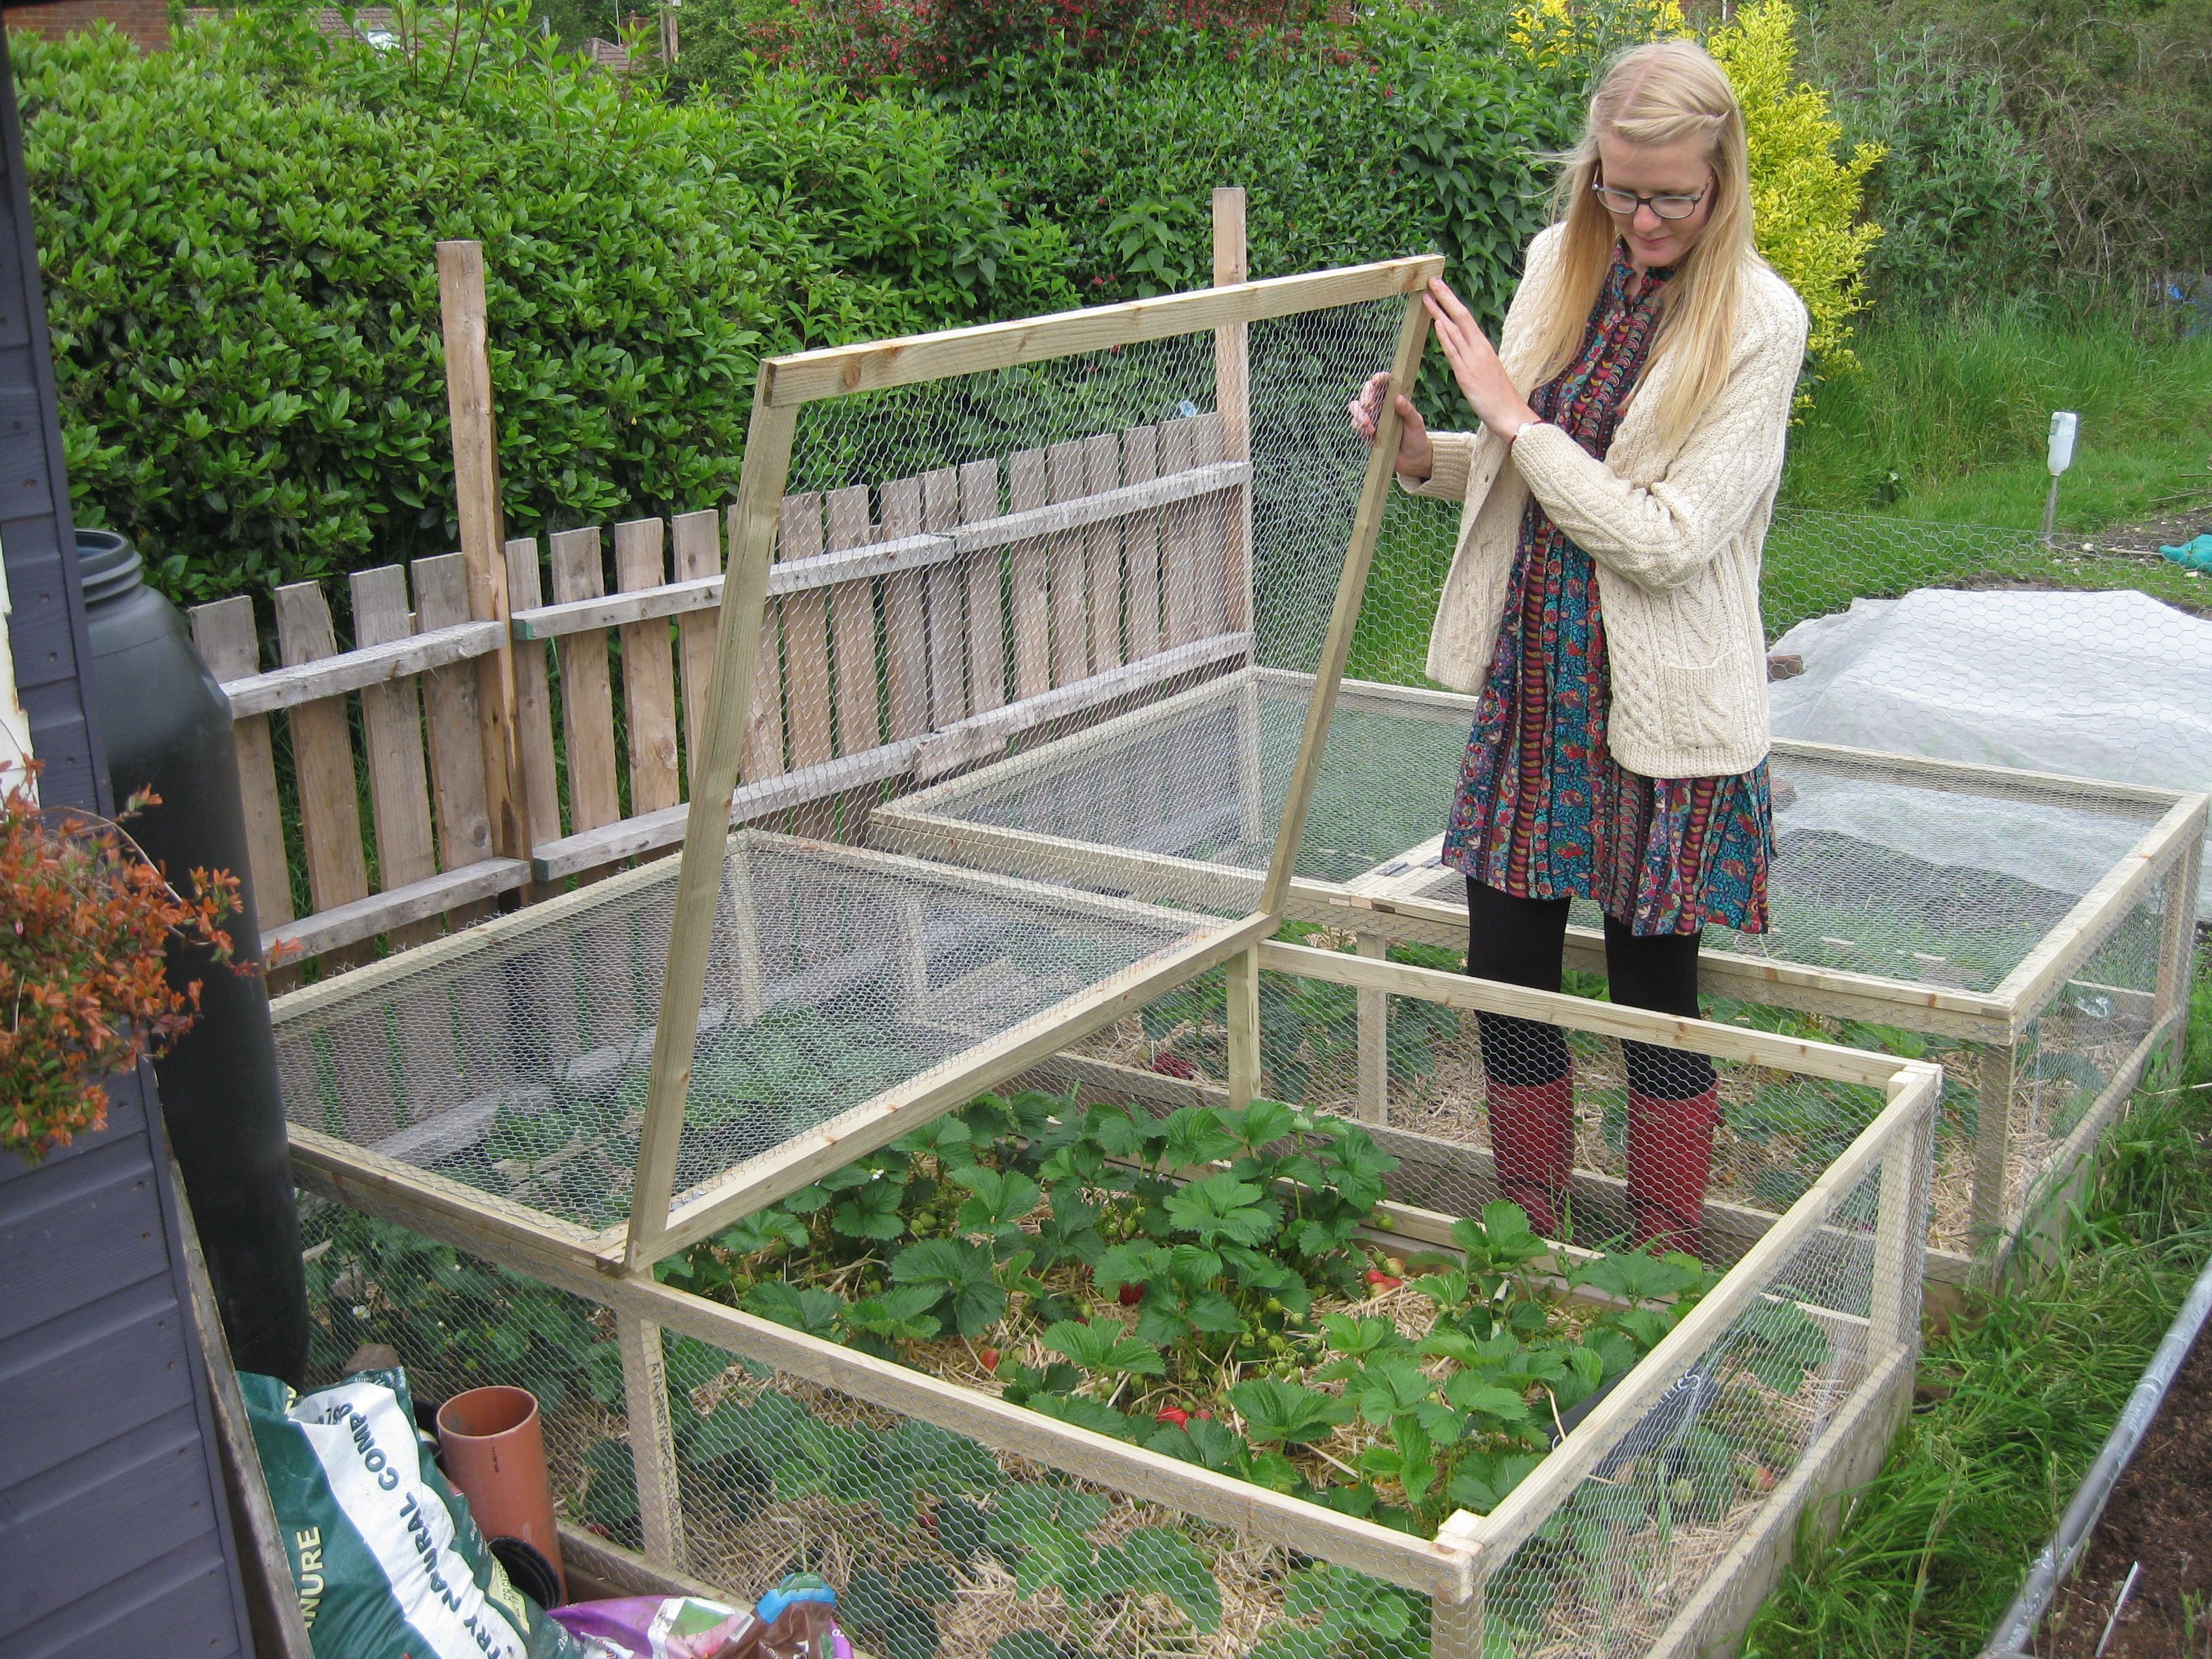 8 stunning diy ideas: vegetable garden photography summer